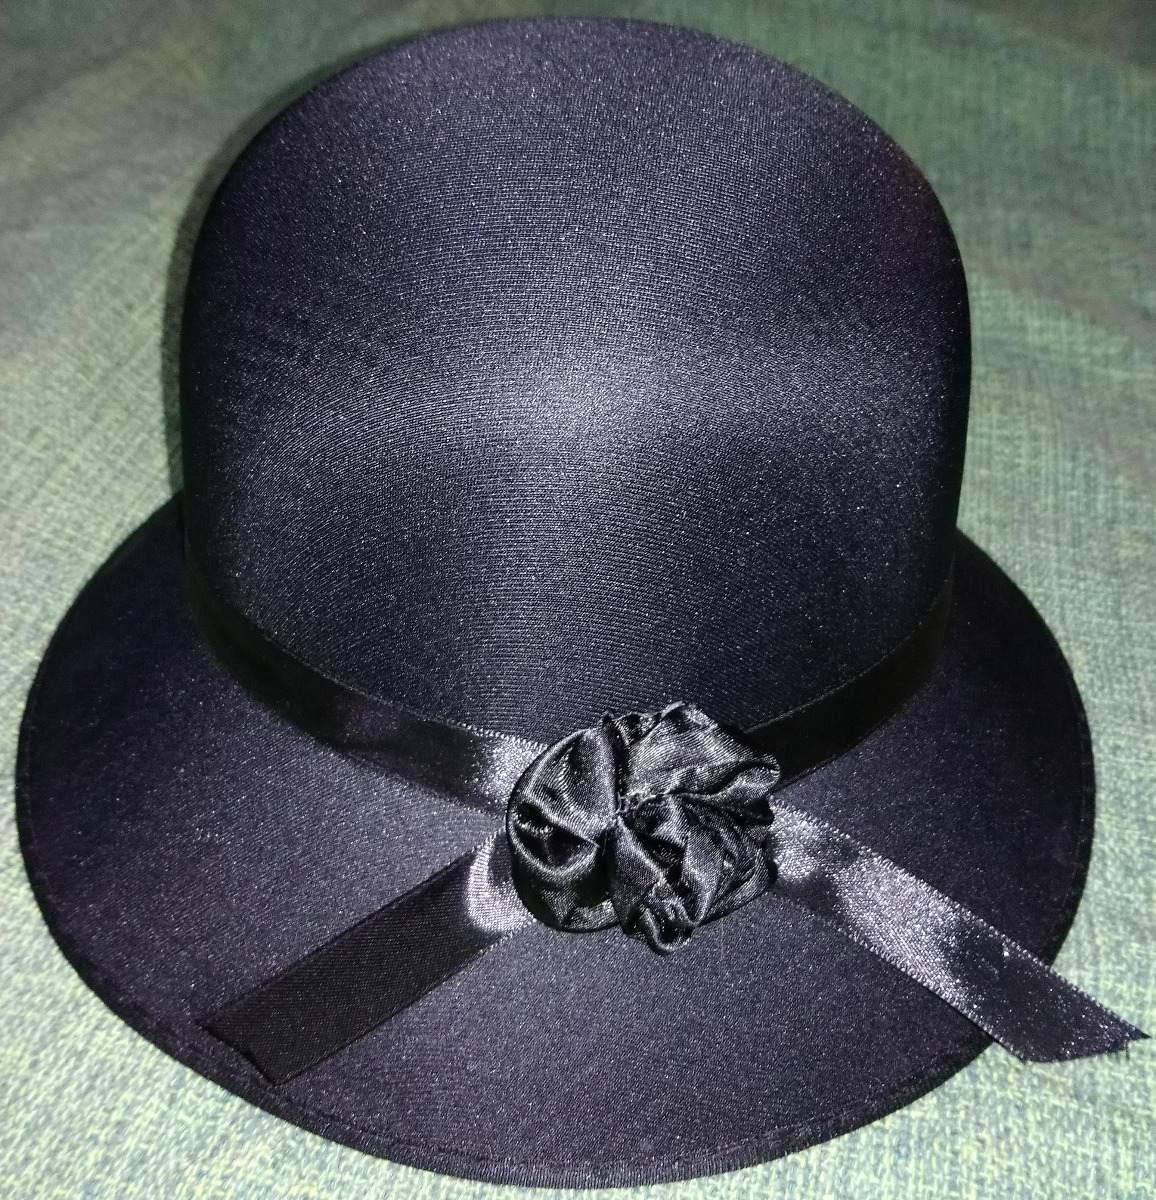 38aa9d61a4317 chapéu estilo charleston feminino anos 20 importado. Carregando zoom.